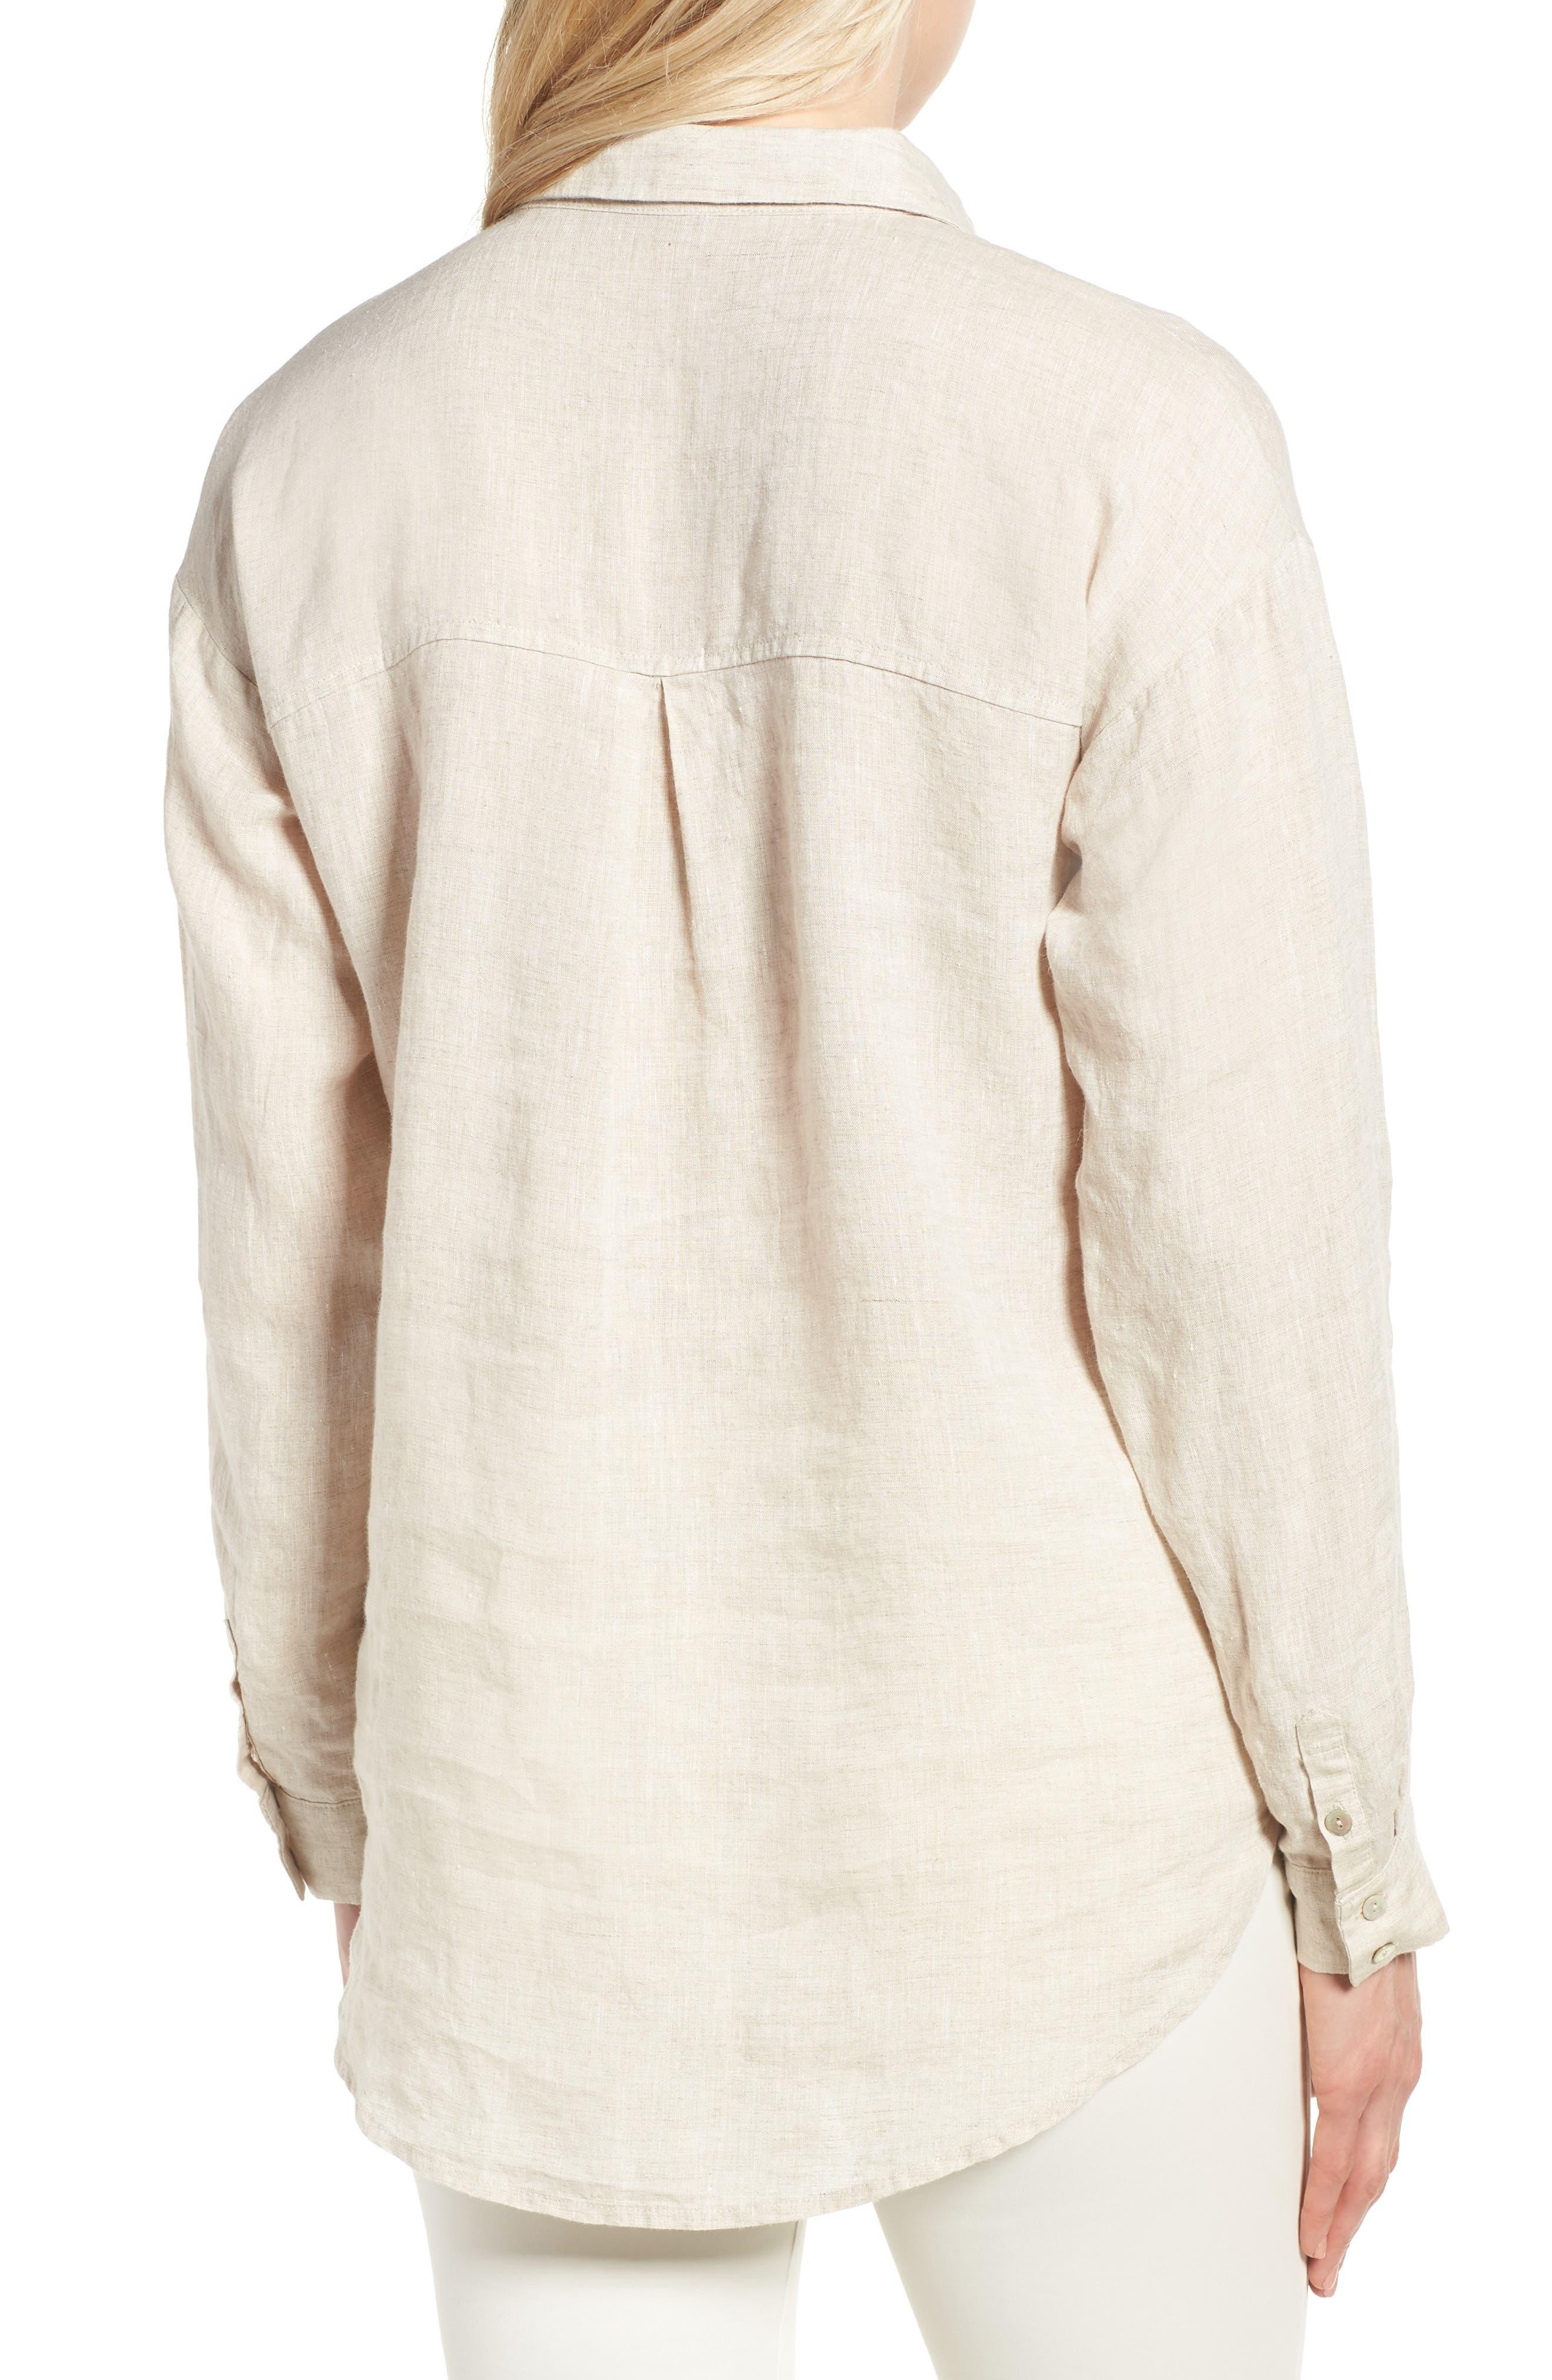 Organic Linen Shirt,                             Alternate thumbnail 2, color,                             Natural